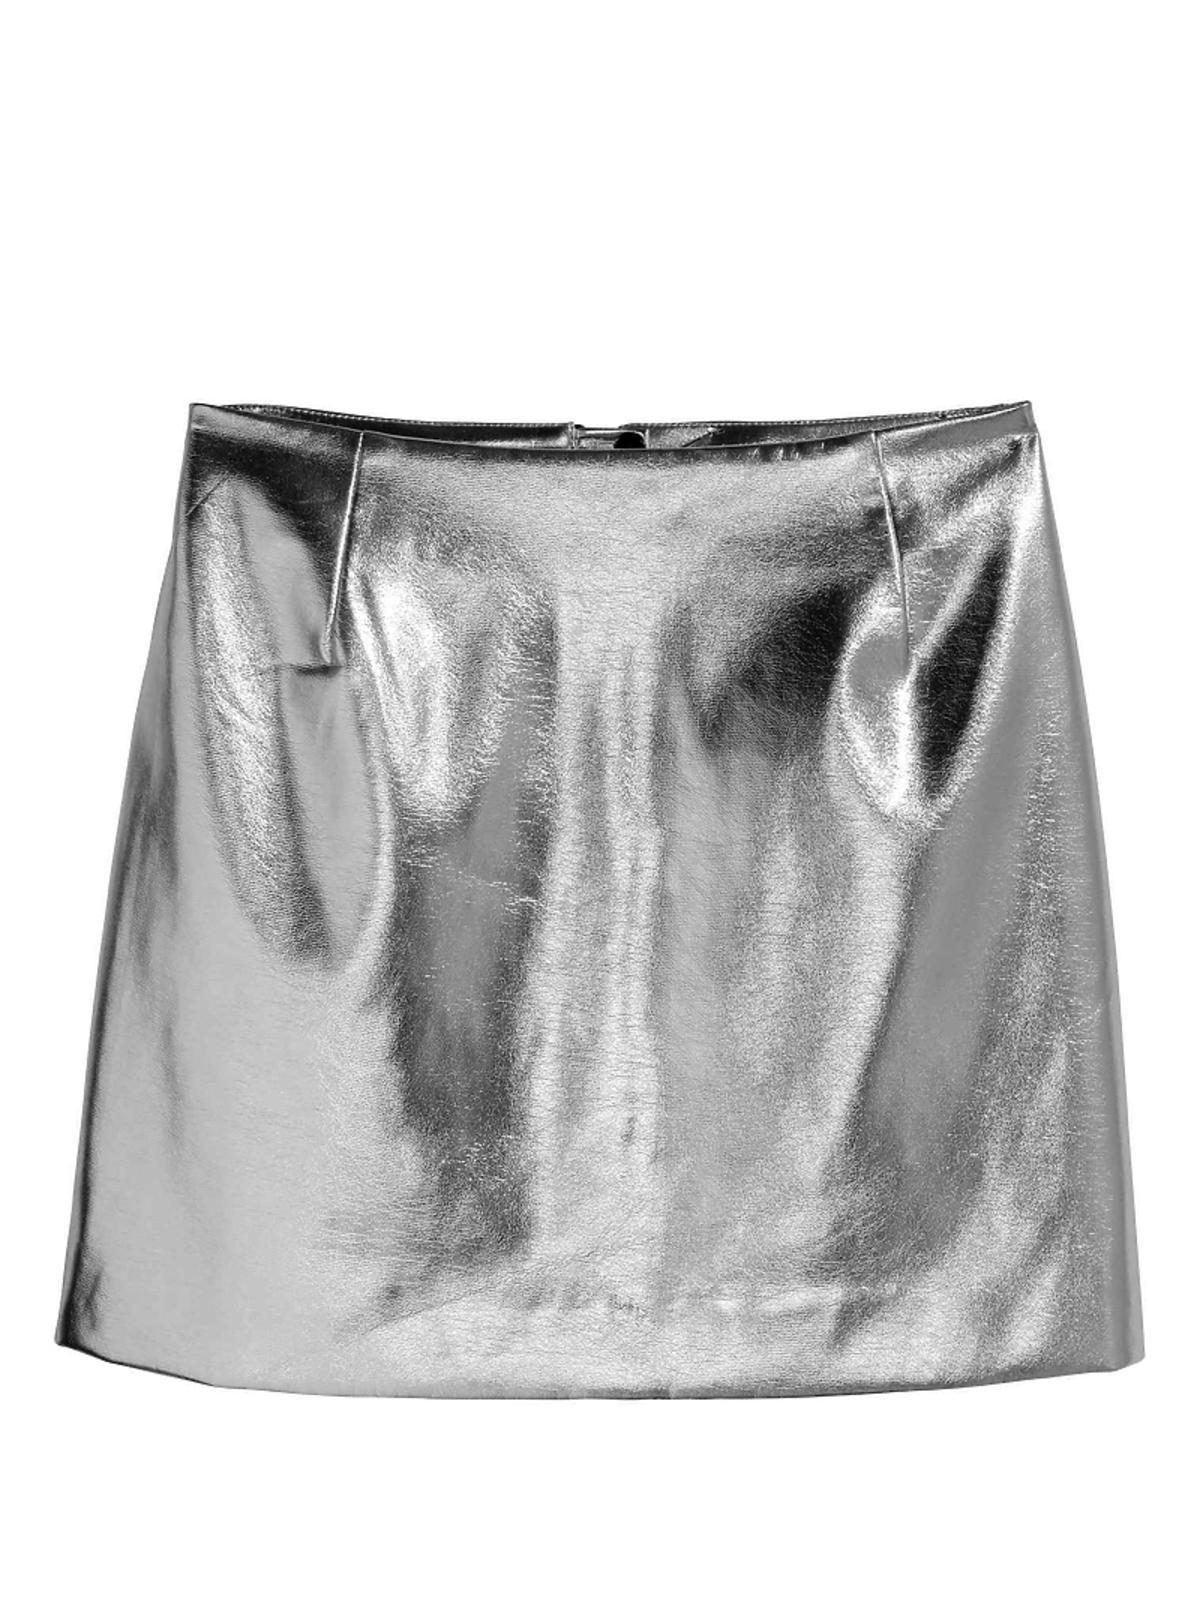 Srebrna spódnica,  H&M, przeceniona z 99,90 zł na 59,90 zł